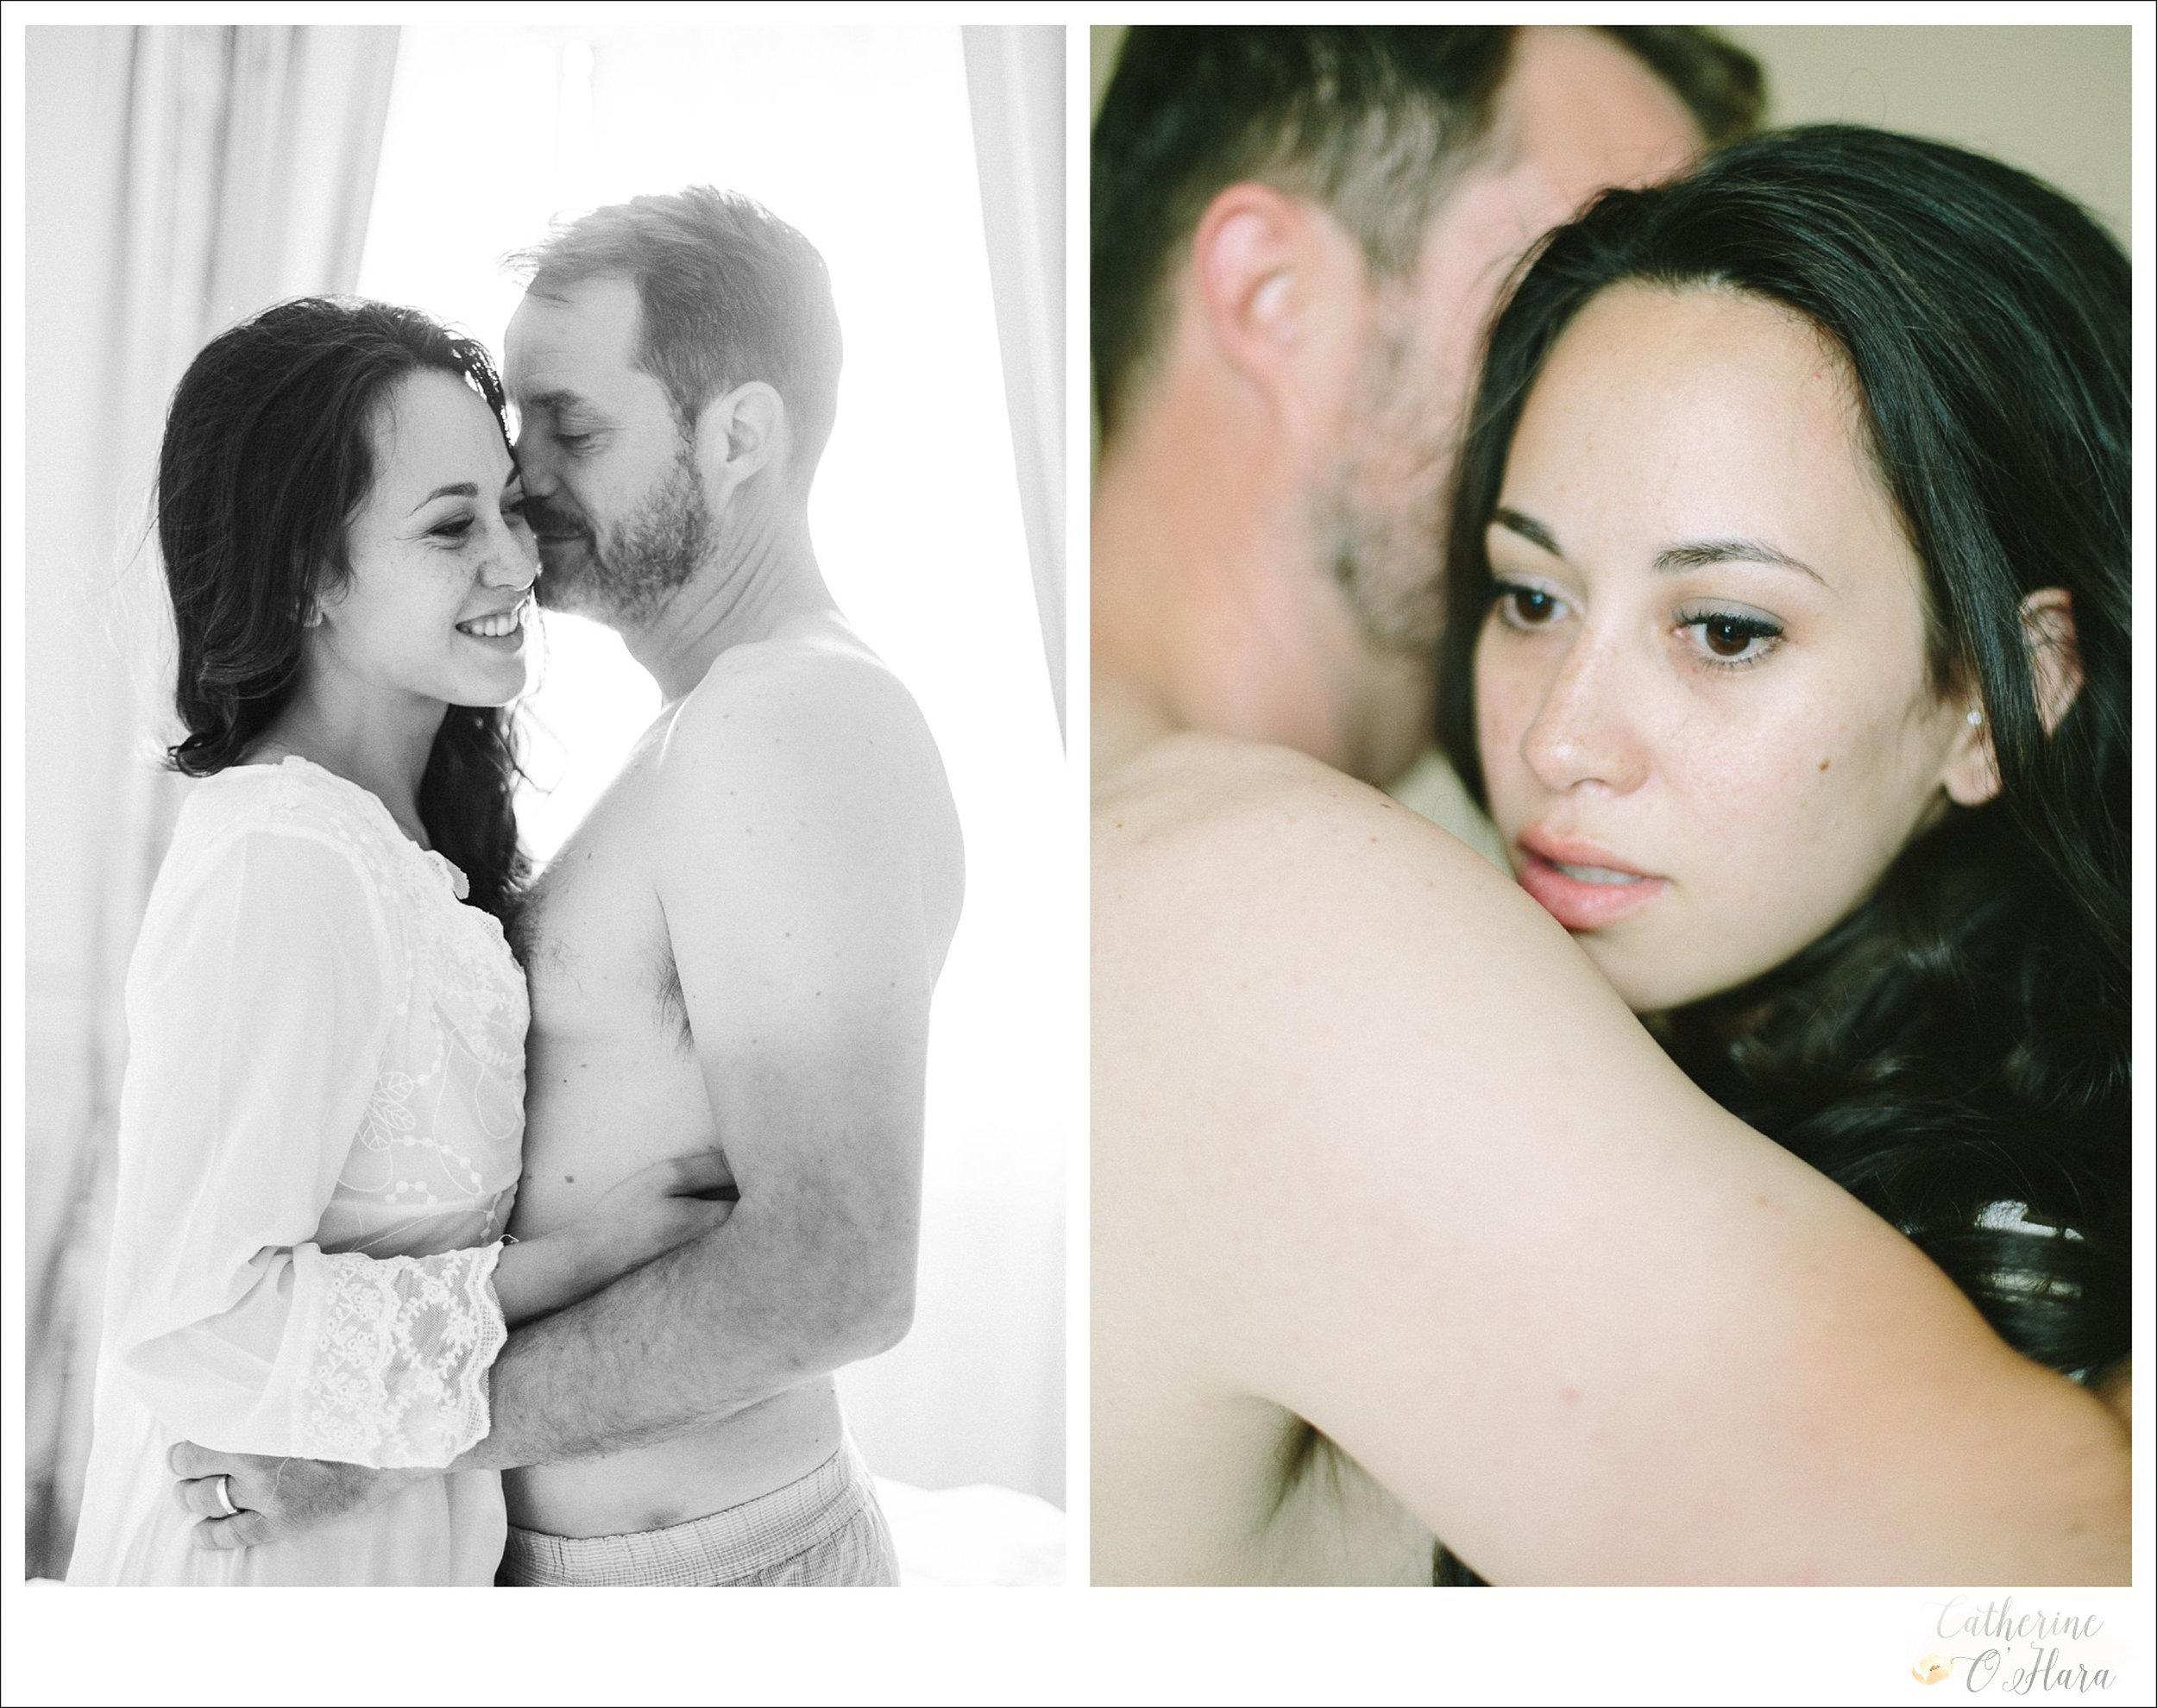 11-paris-couples-boudoir-photographer.jpg